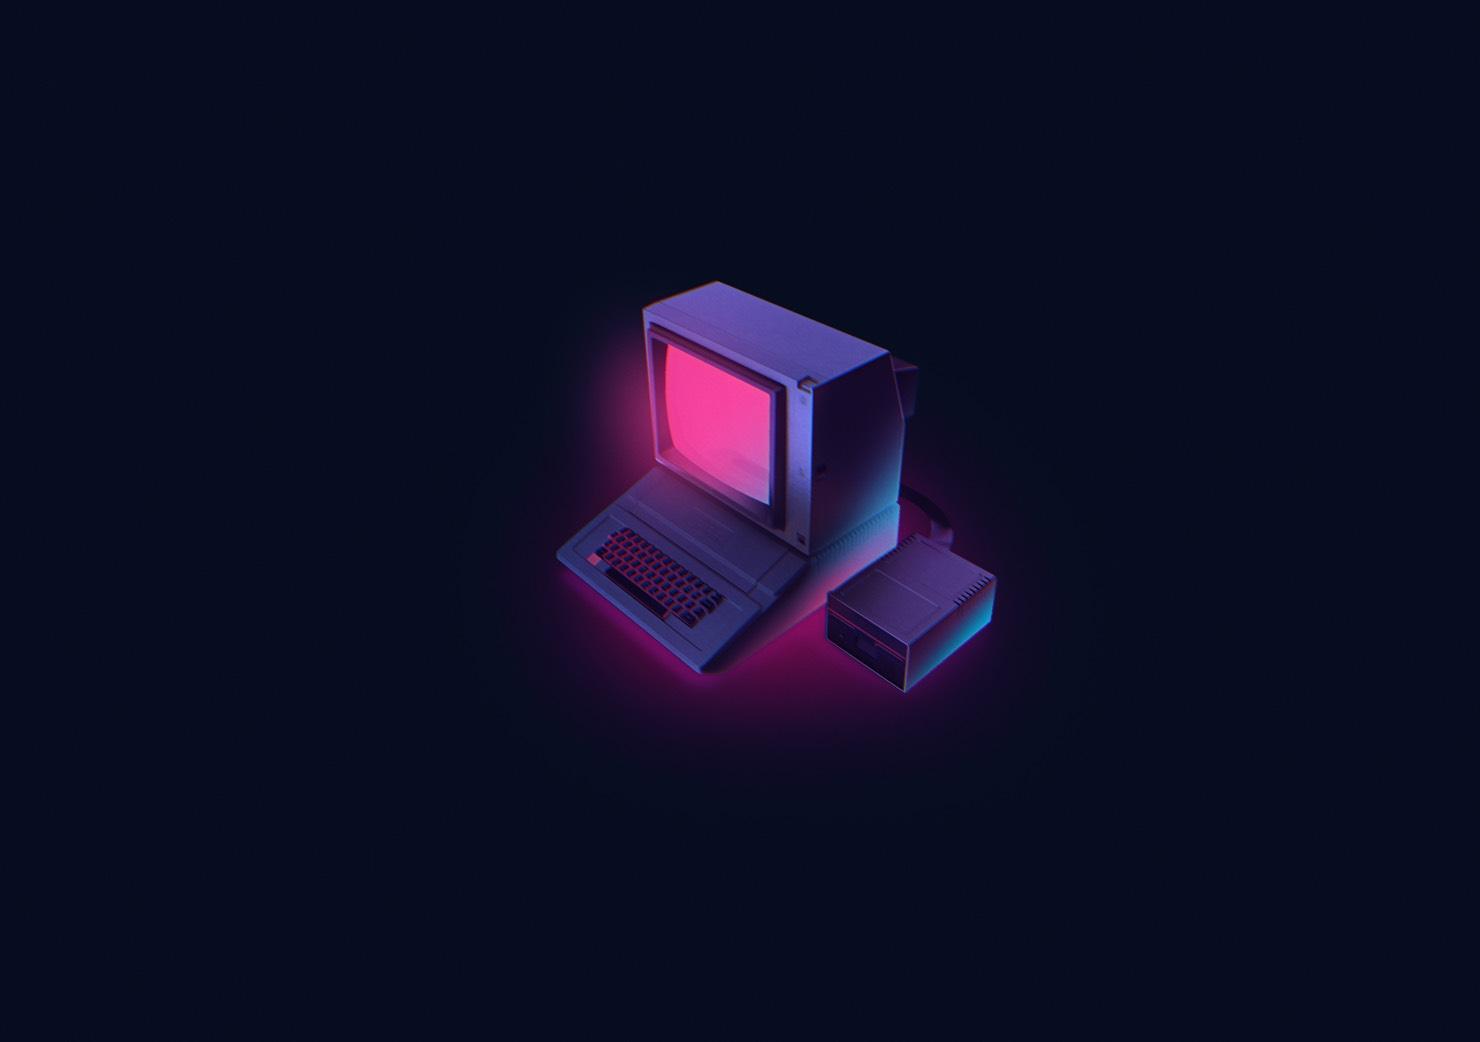 Matt Mancid & Color Theory - Peripheral